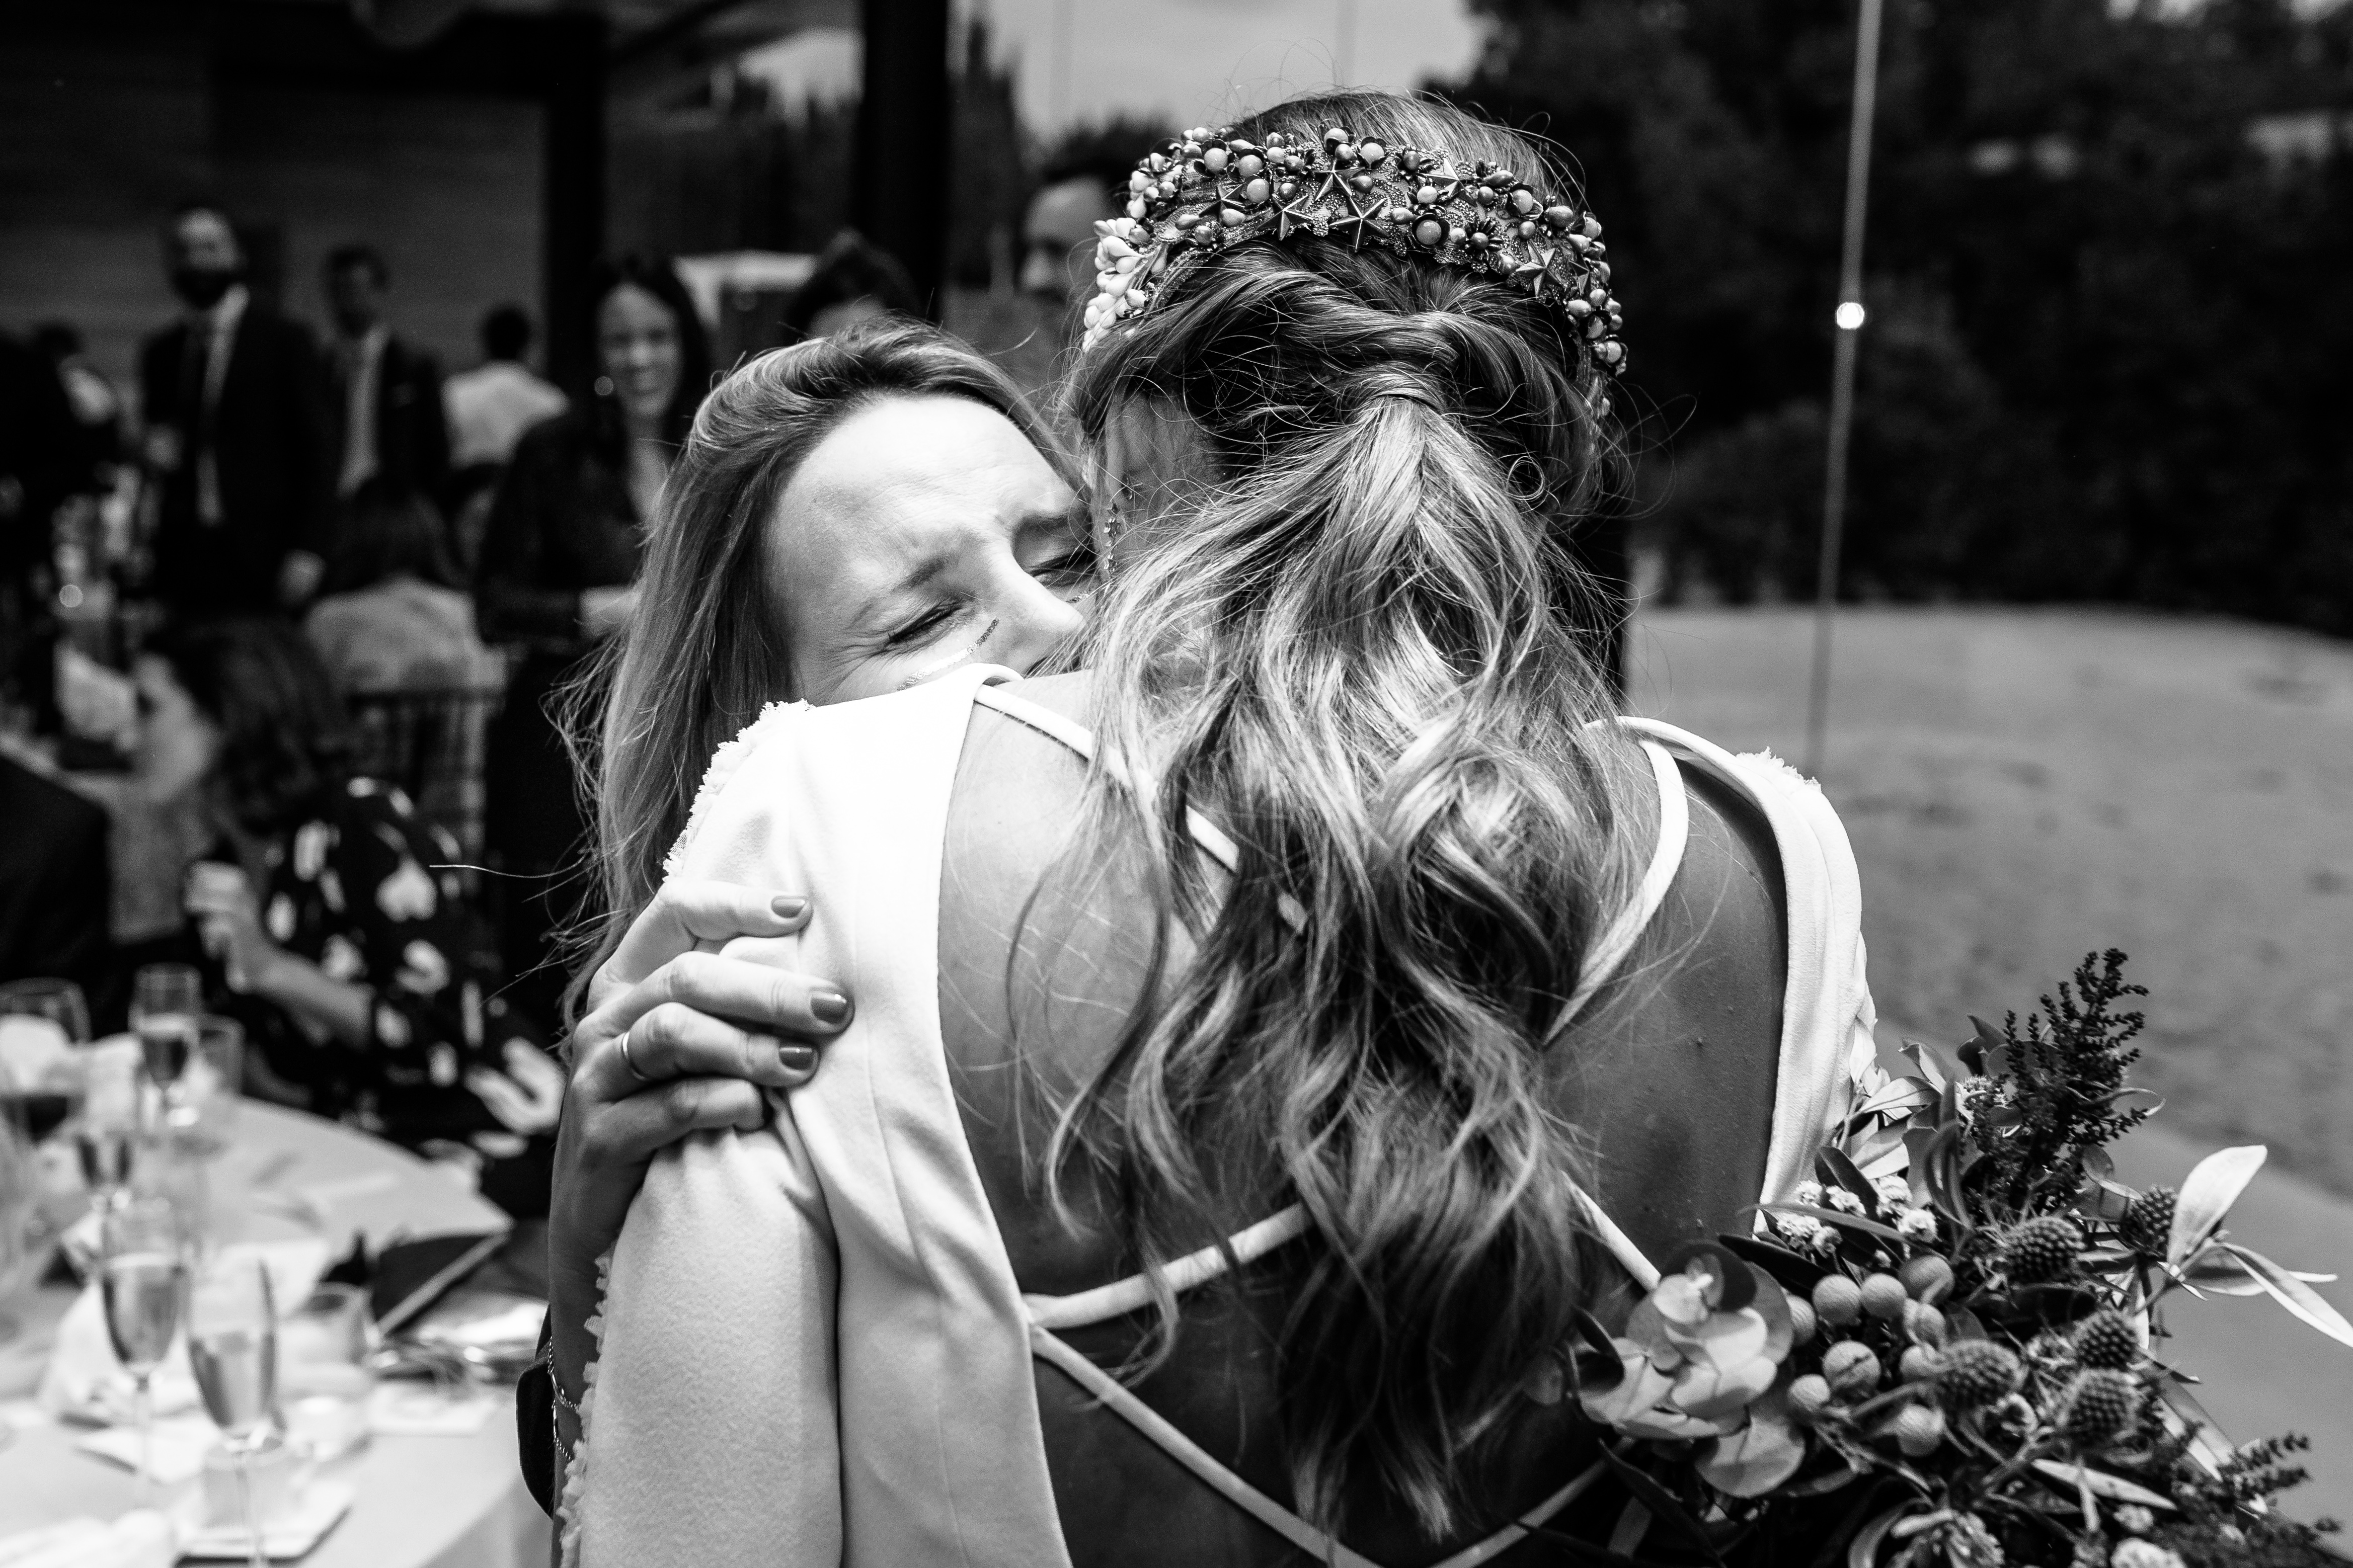 mandarina weddig, fotografos de boda, fotografo boda soria, fotografo boda barcelona, fotografo boda Madrid, fotografo boda lerida, fotografo boda Huesca_31